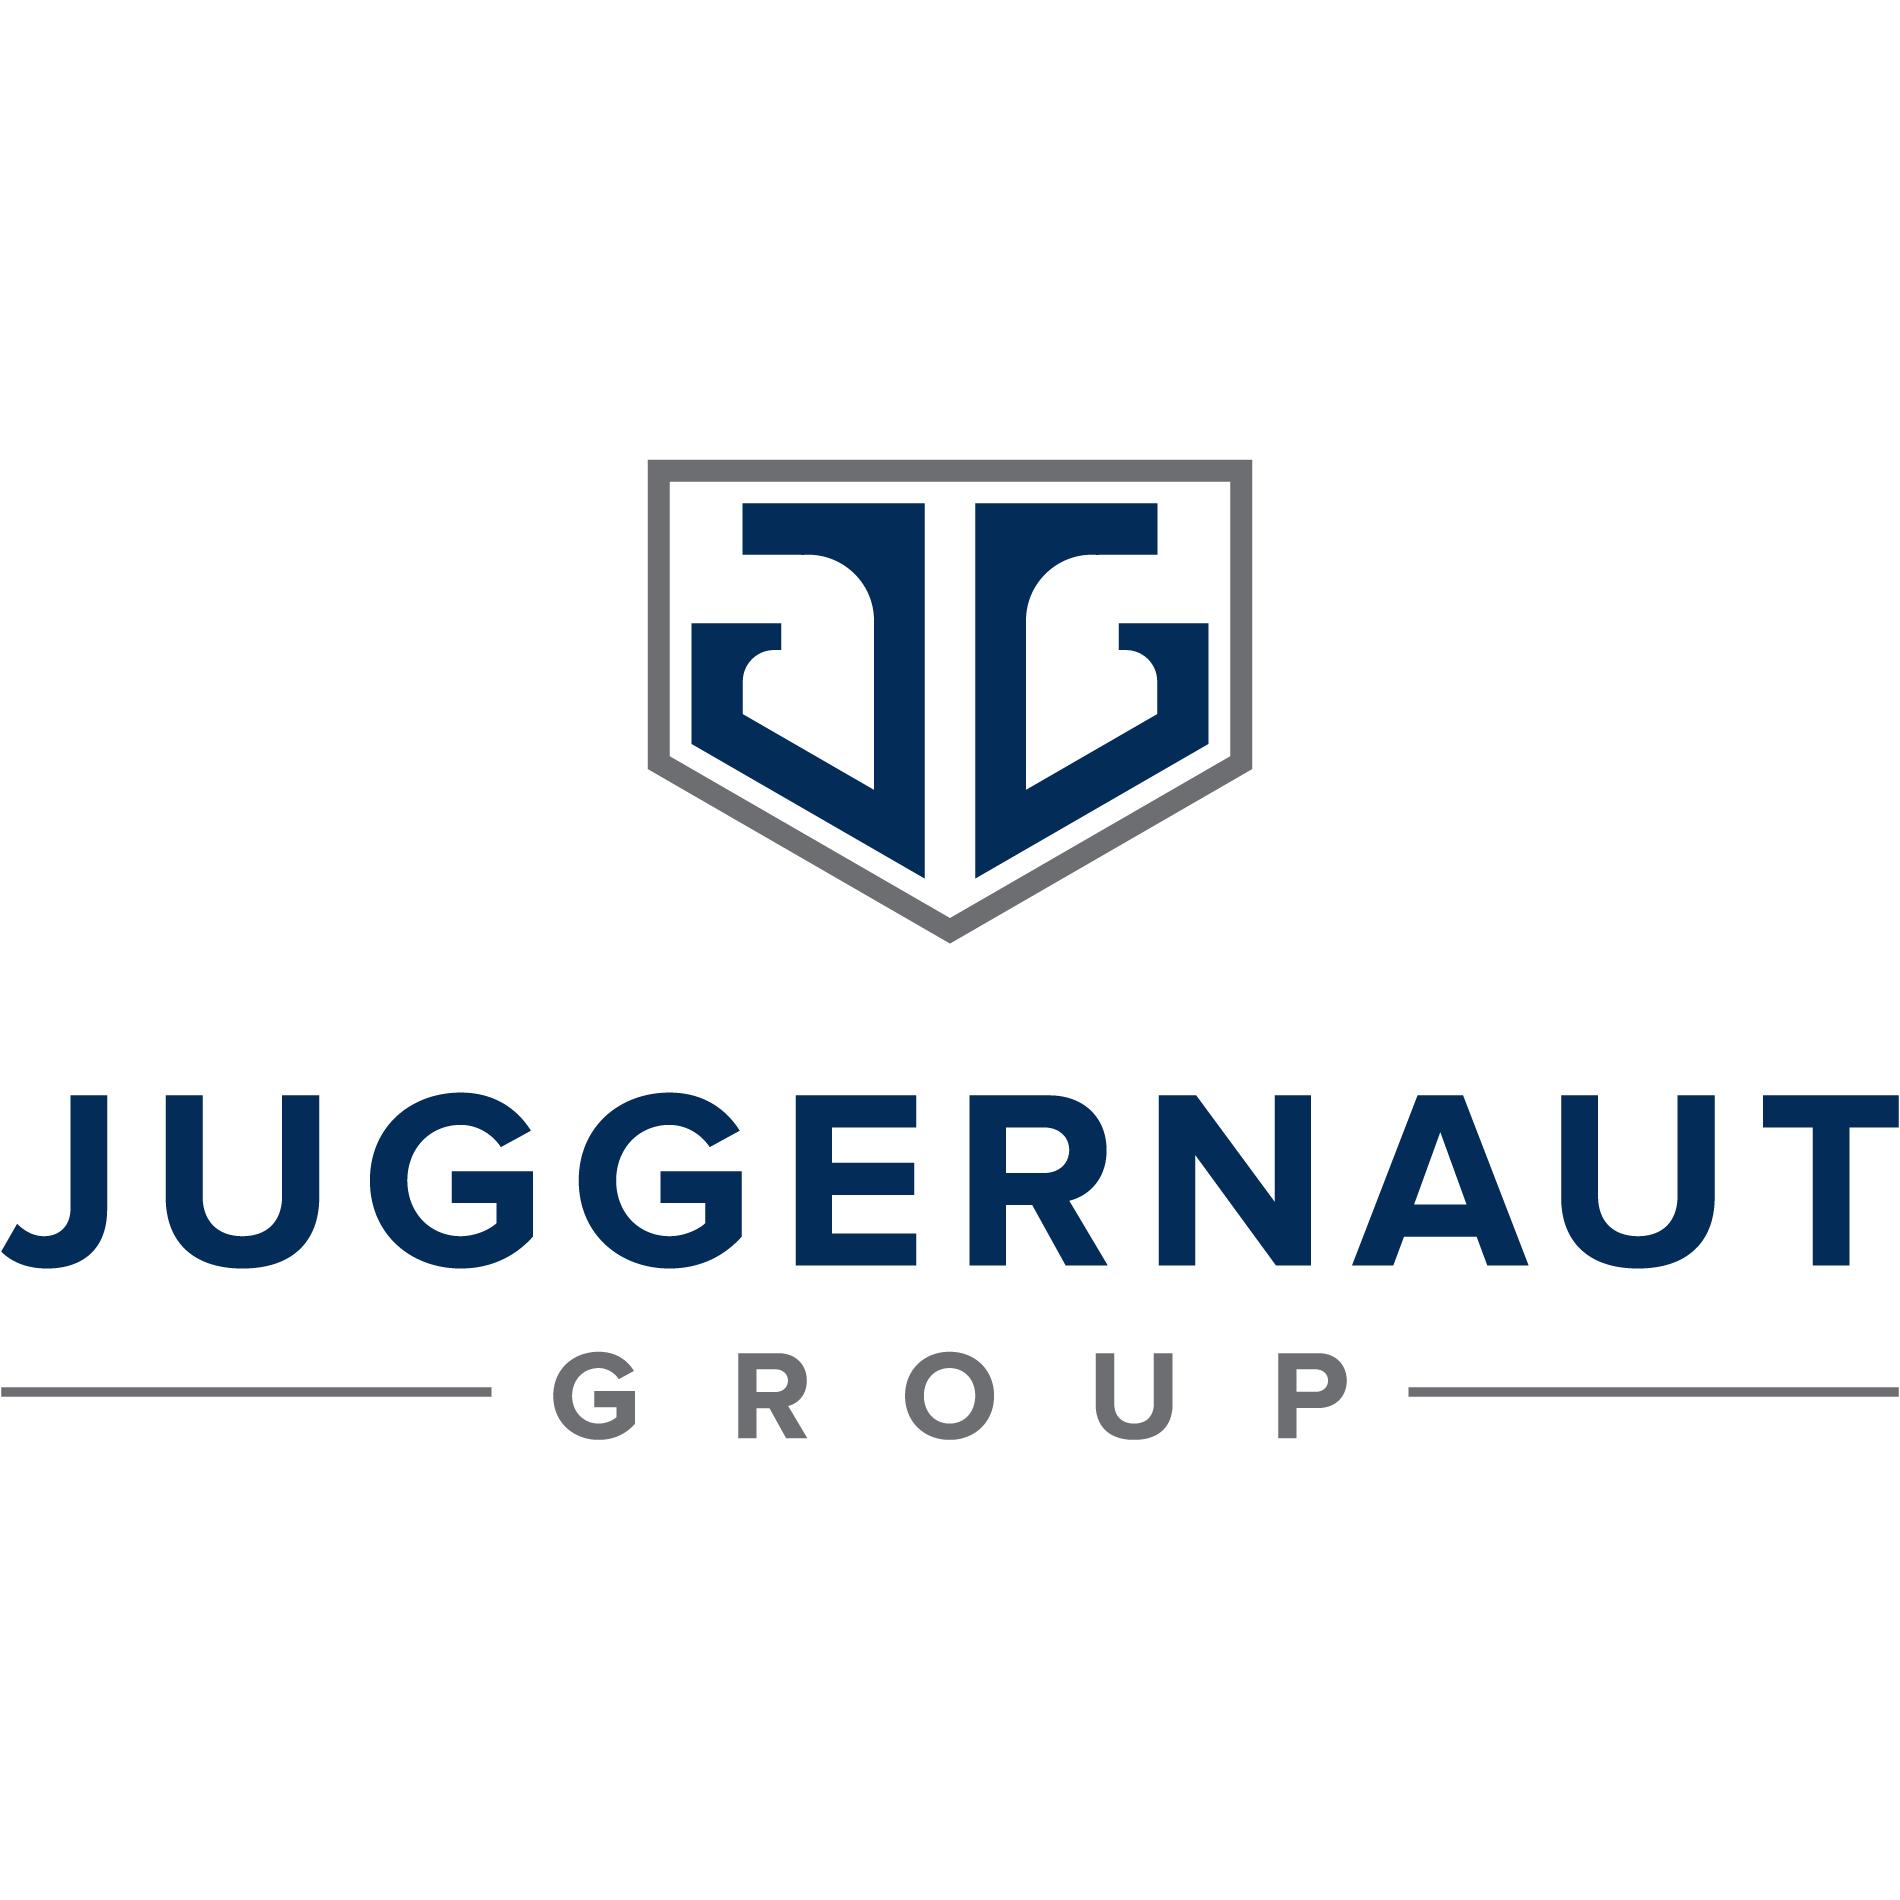 Juggernaut Group